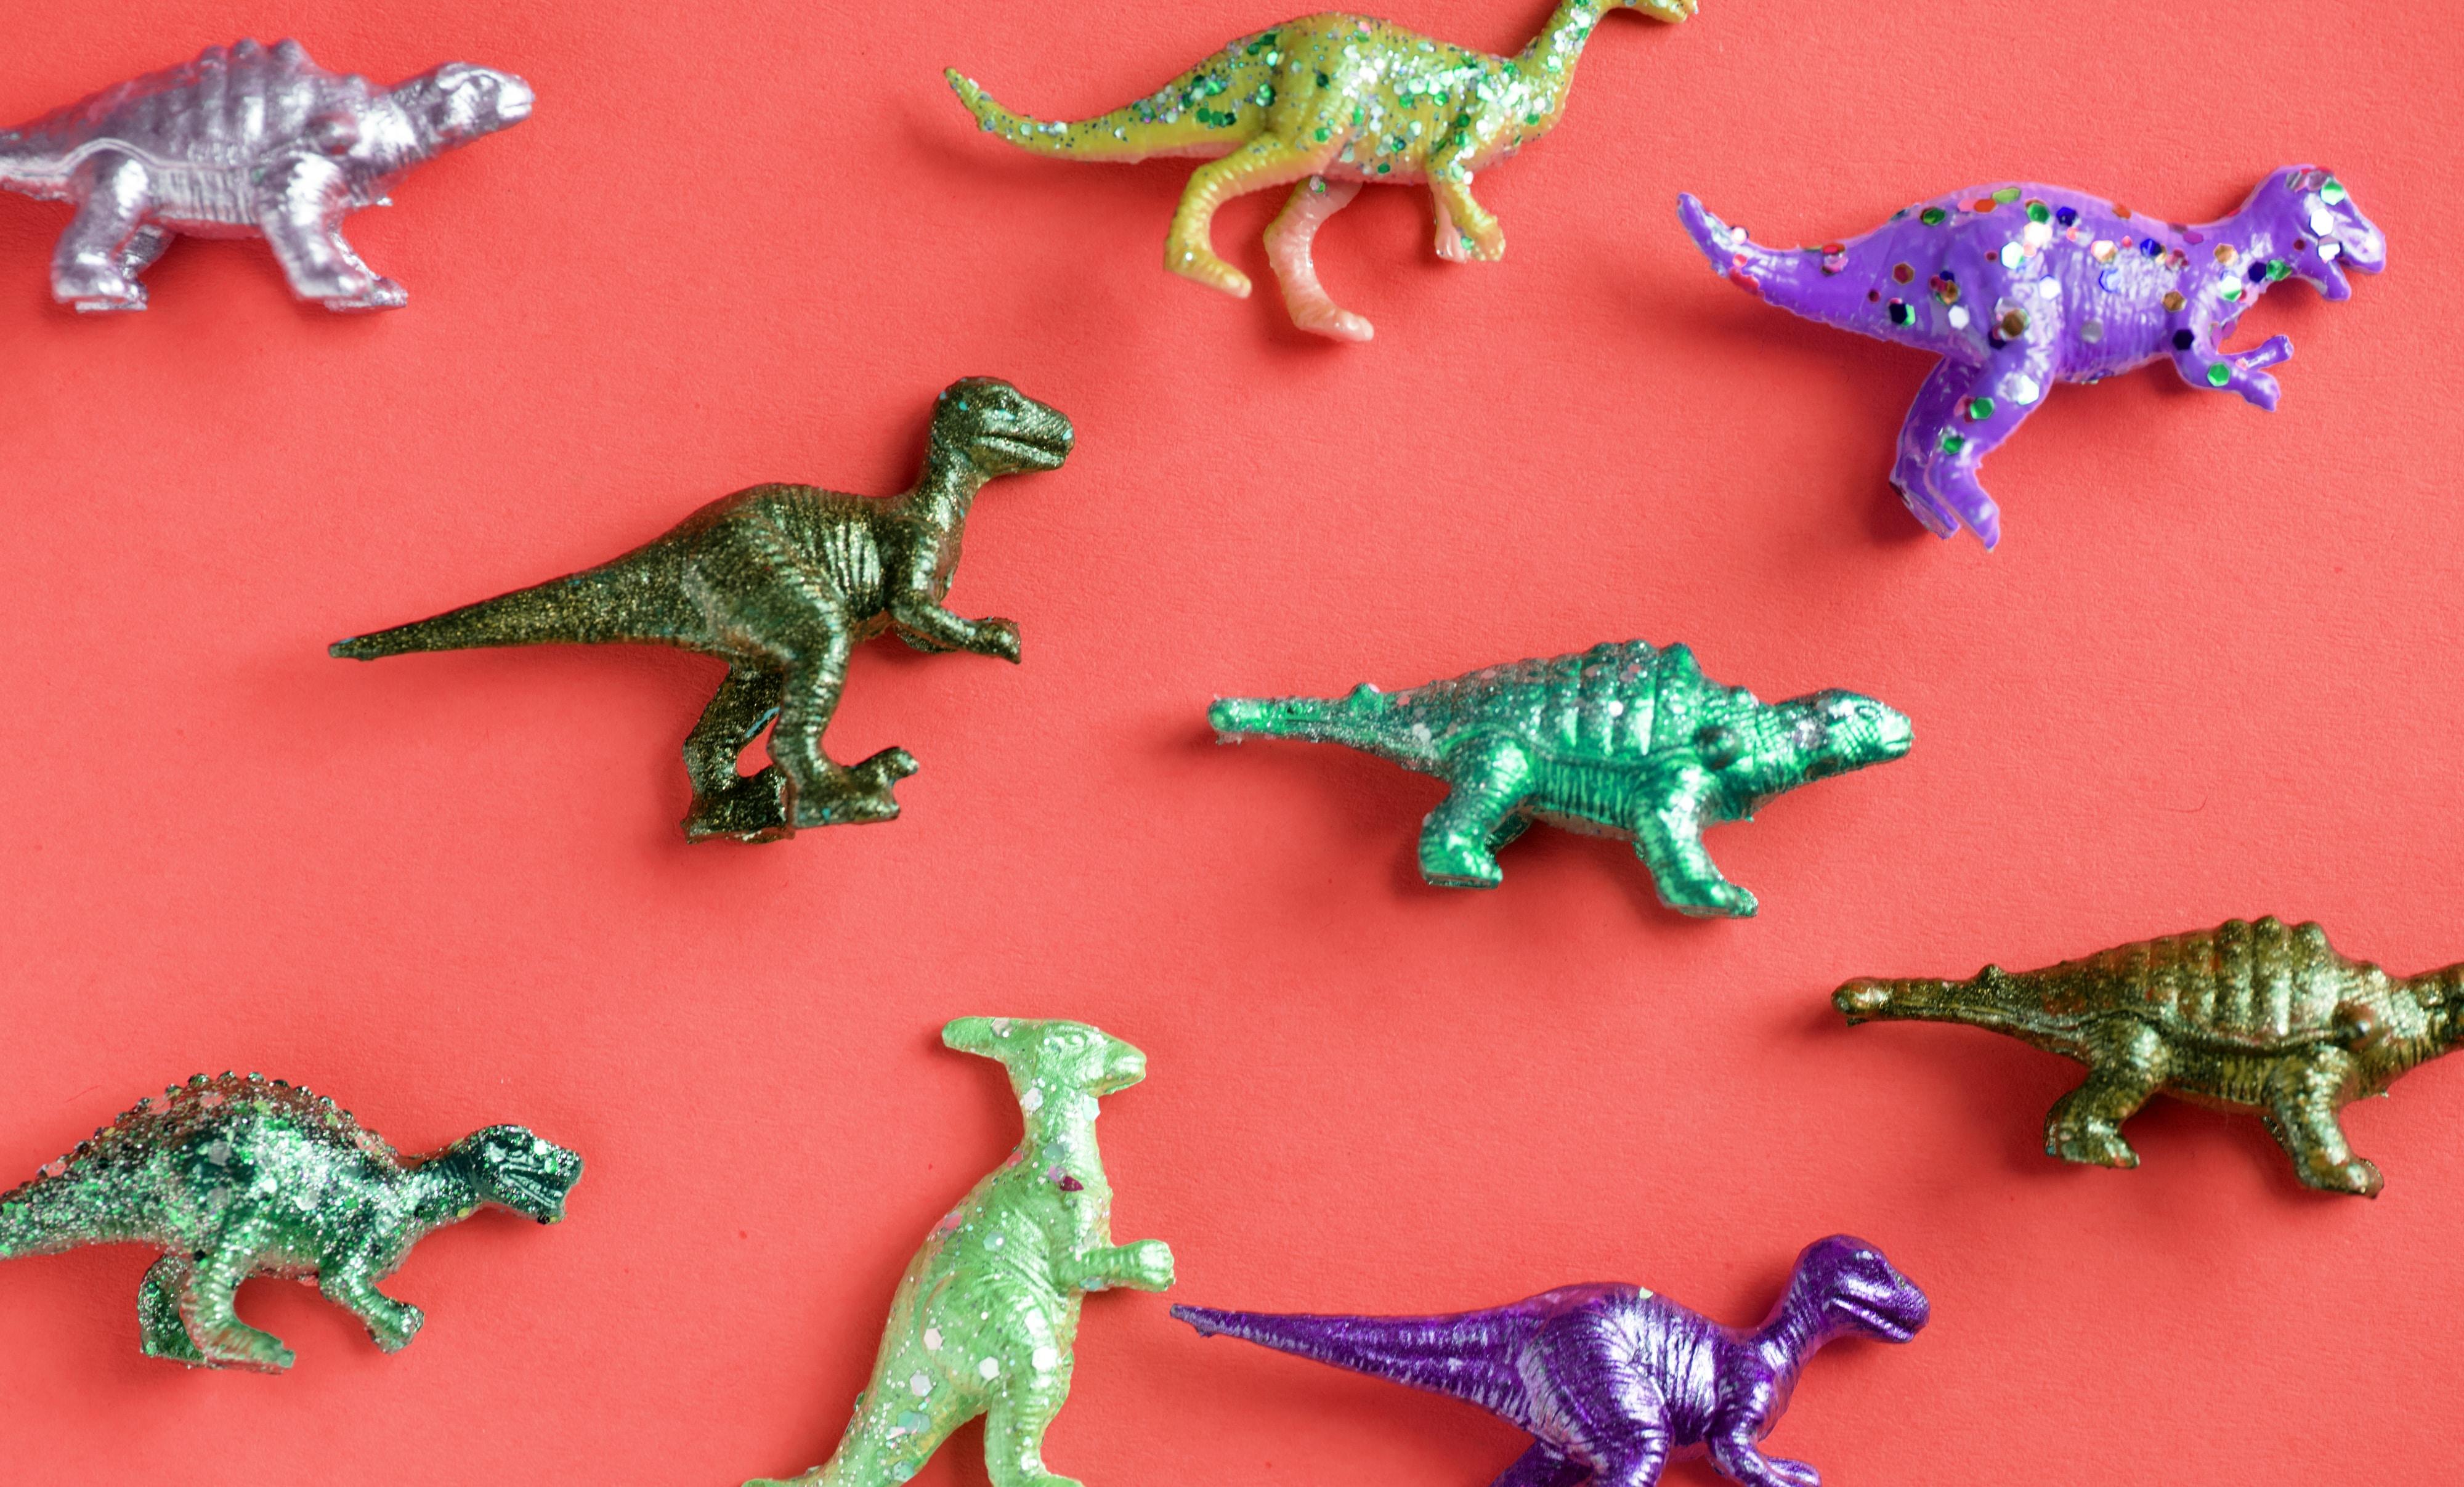 nine assorted-color plastic dinosaur toys